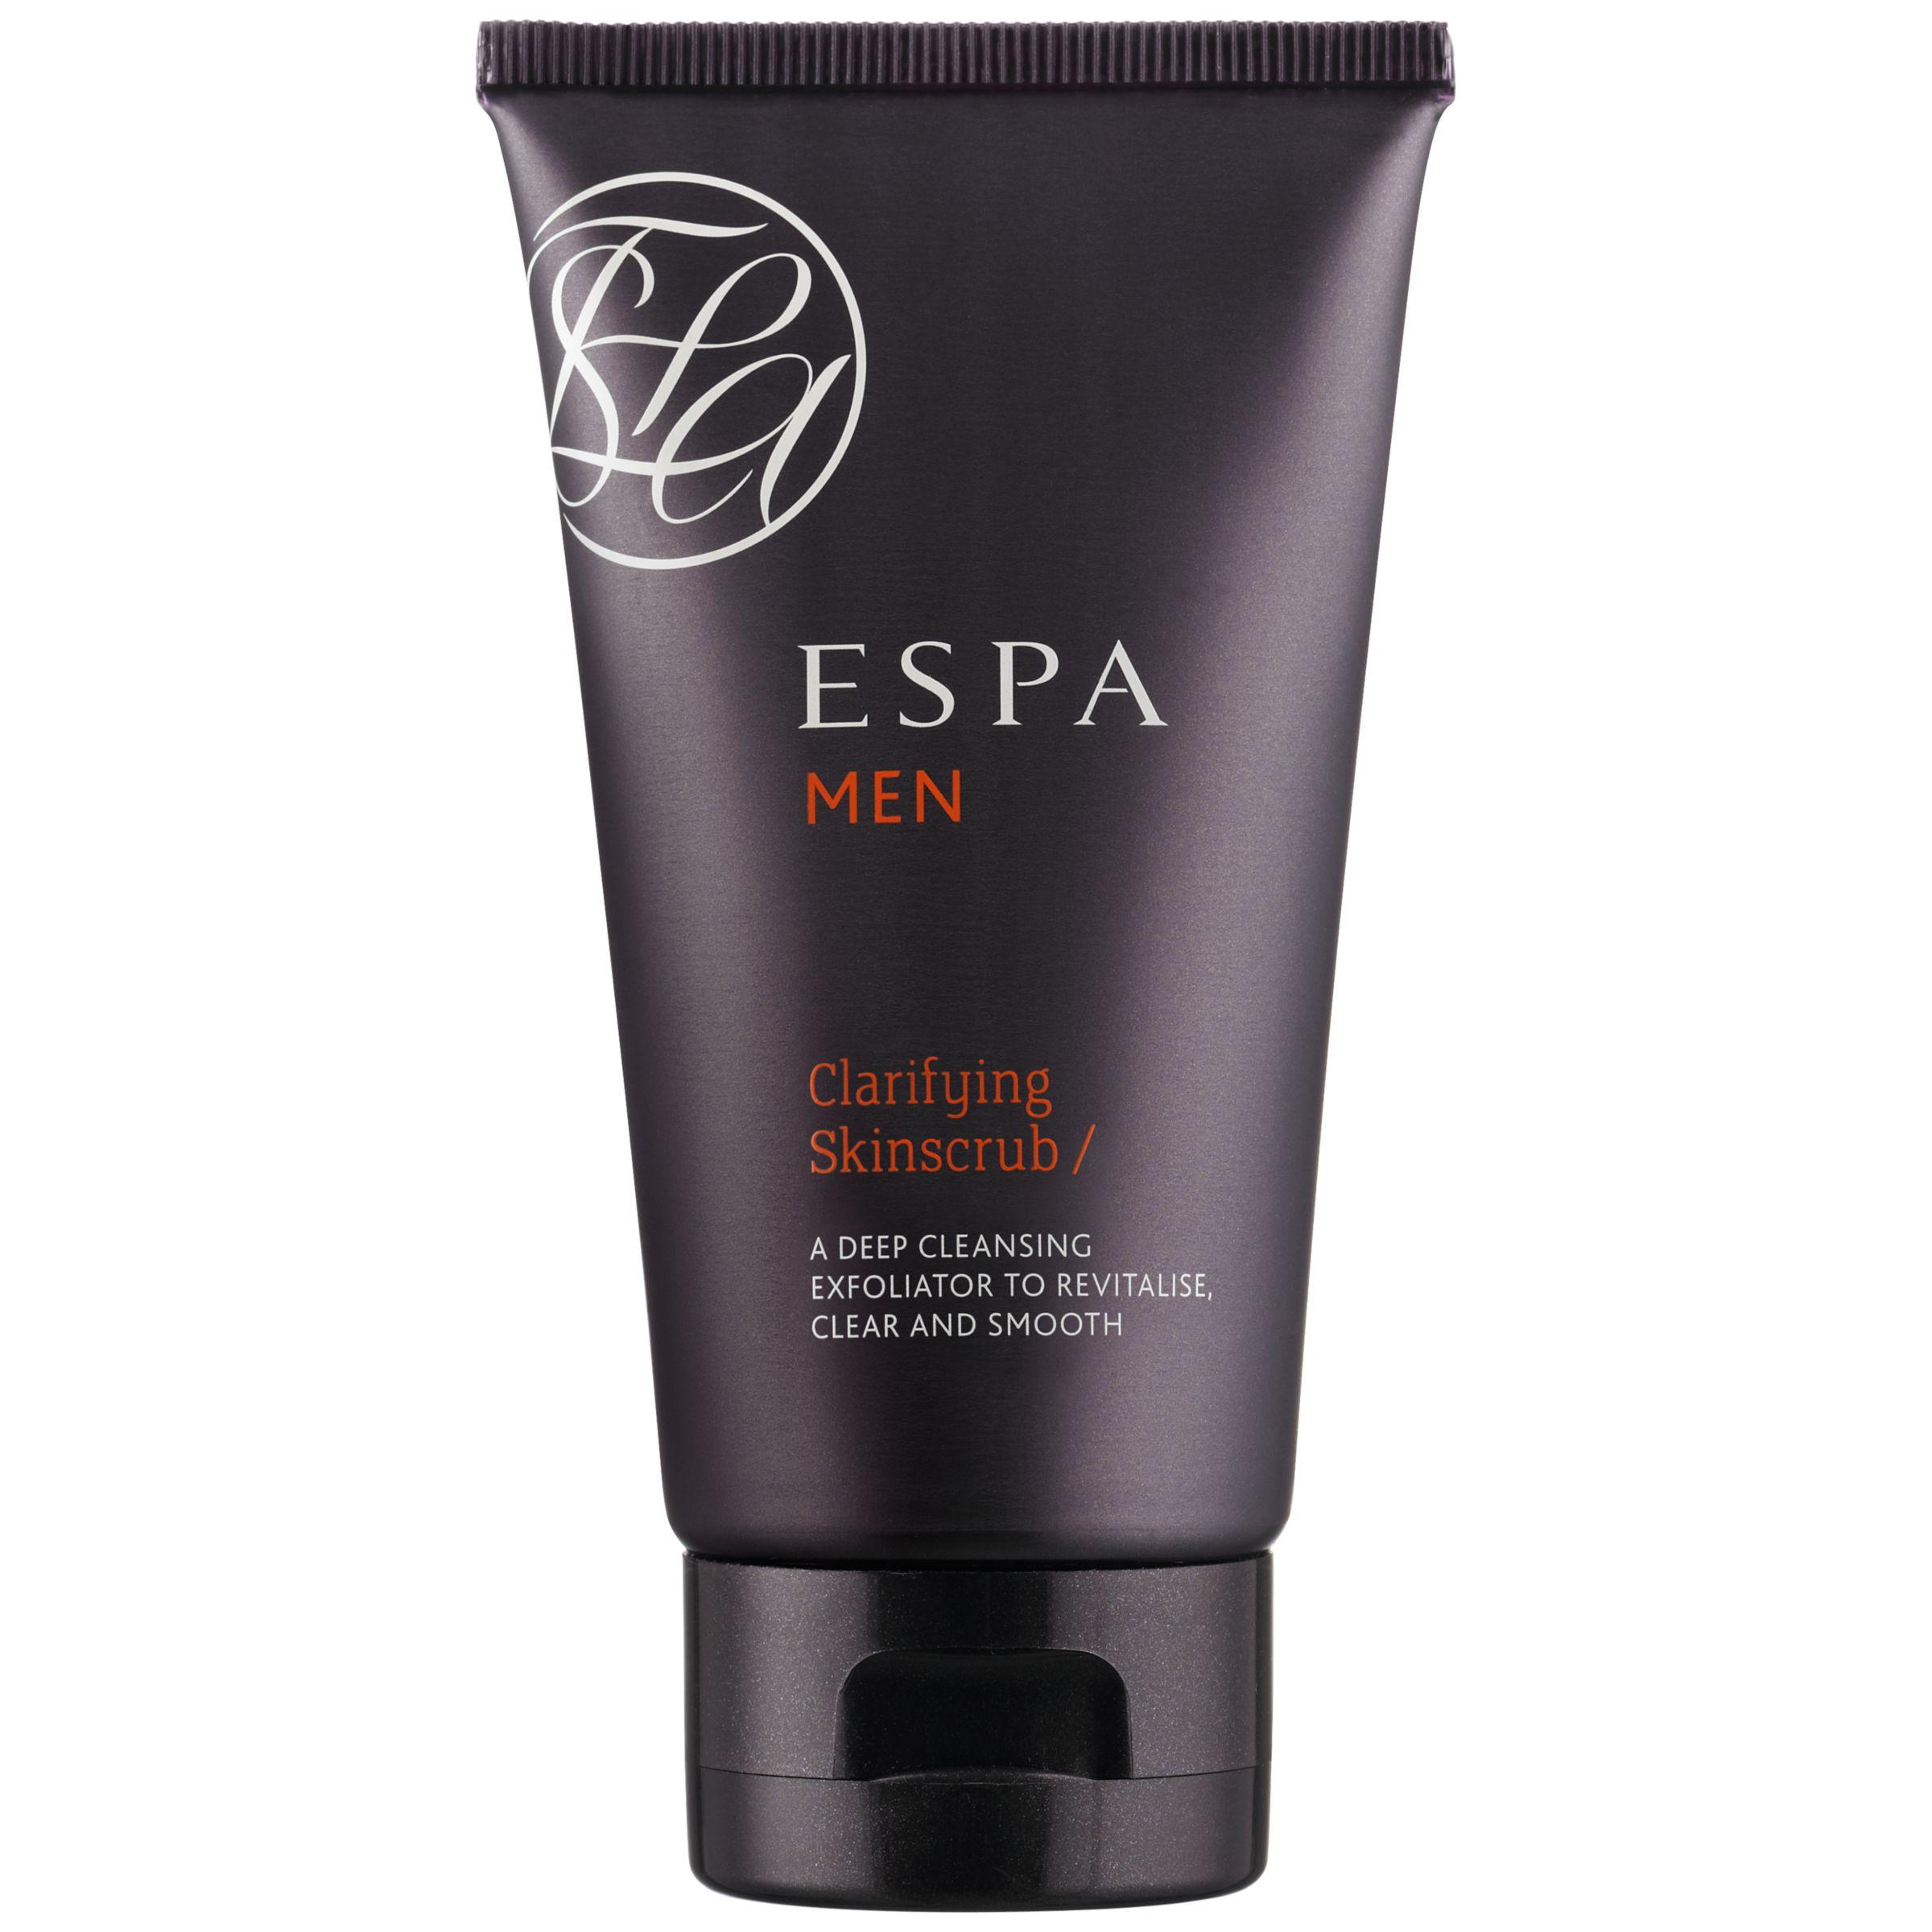 ESPA ESPA Men's Clarifying Skinscrub, 70ml